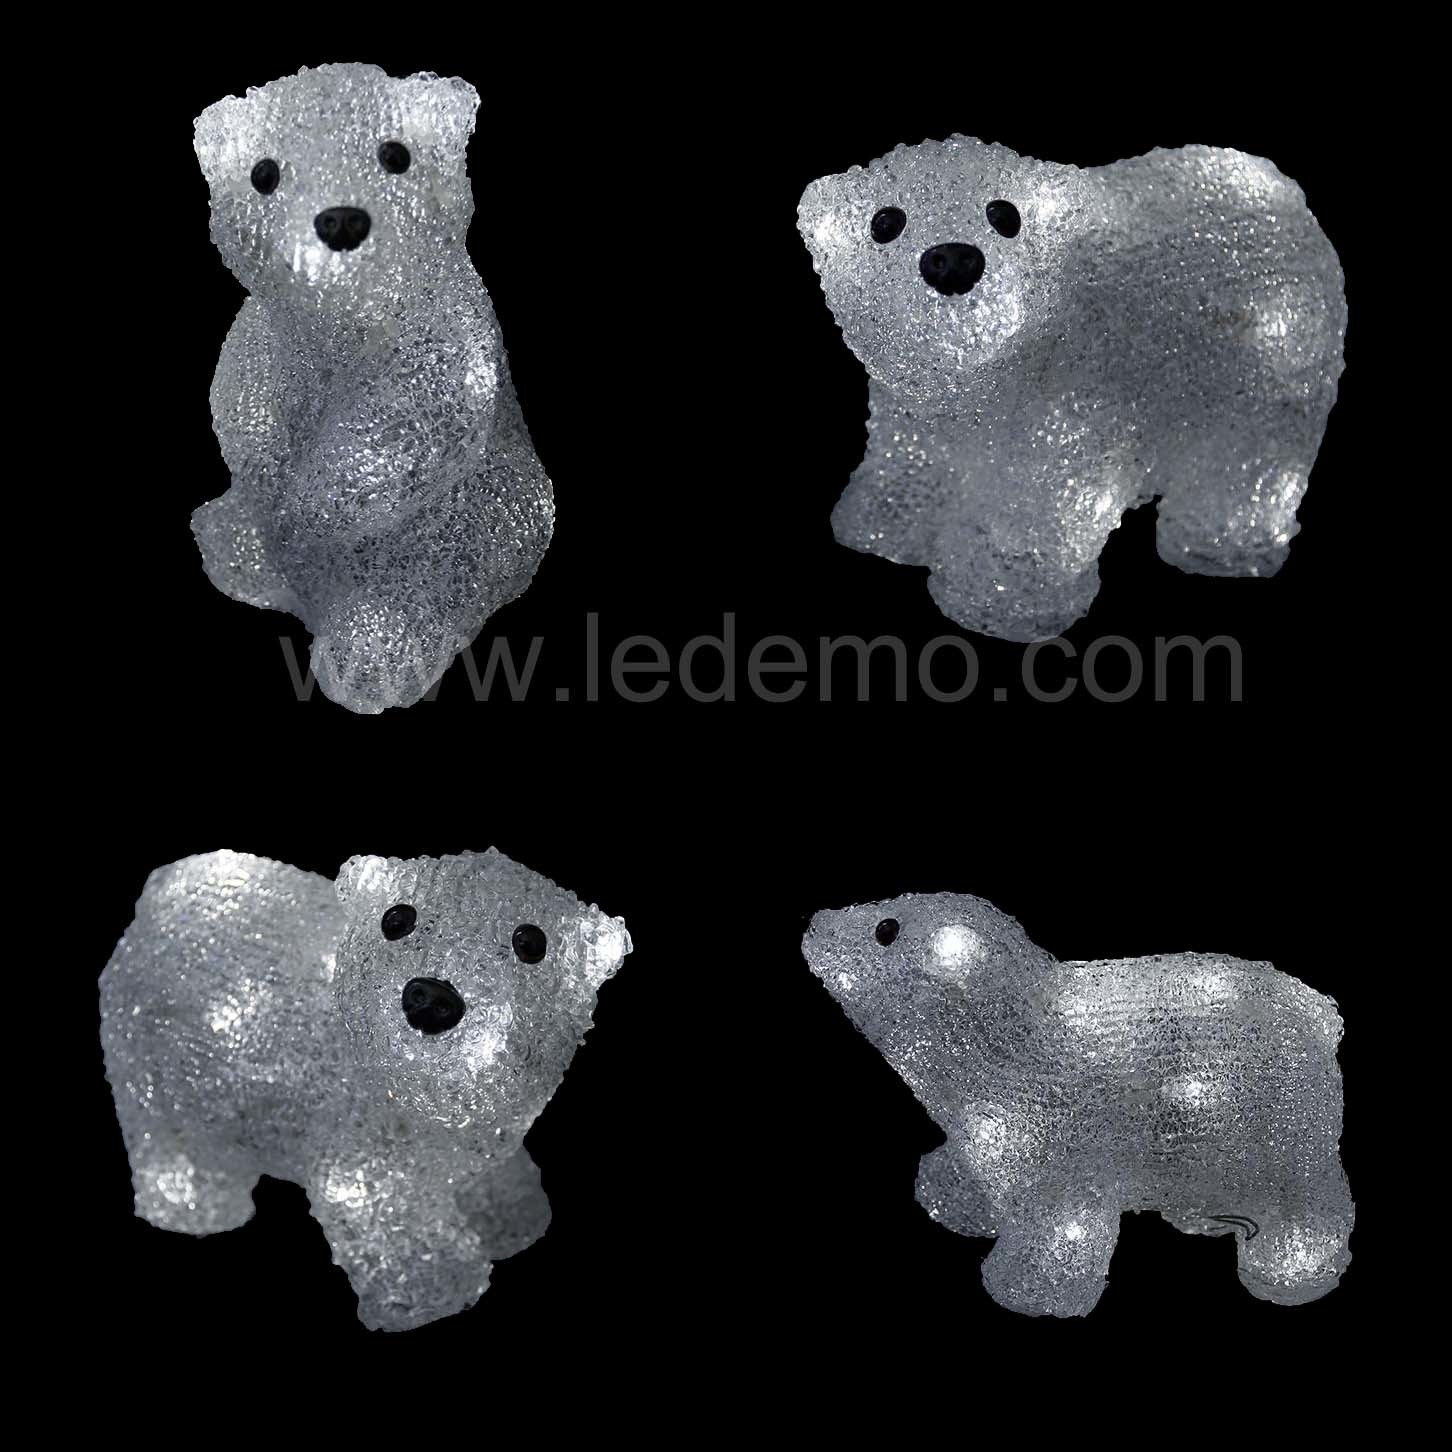 LED Acrylic Decorative USB Bear Light